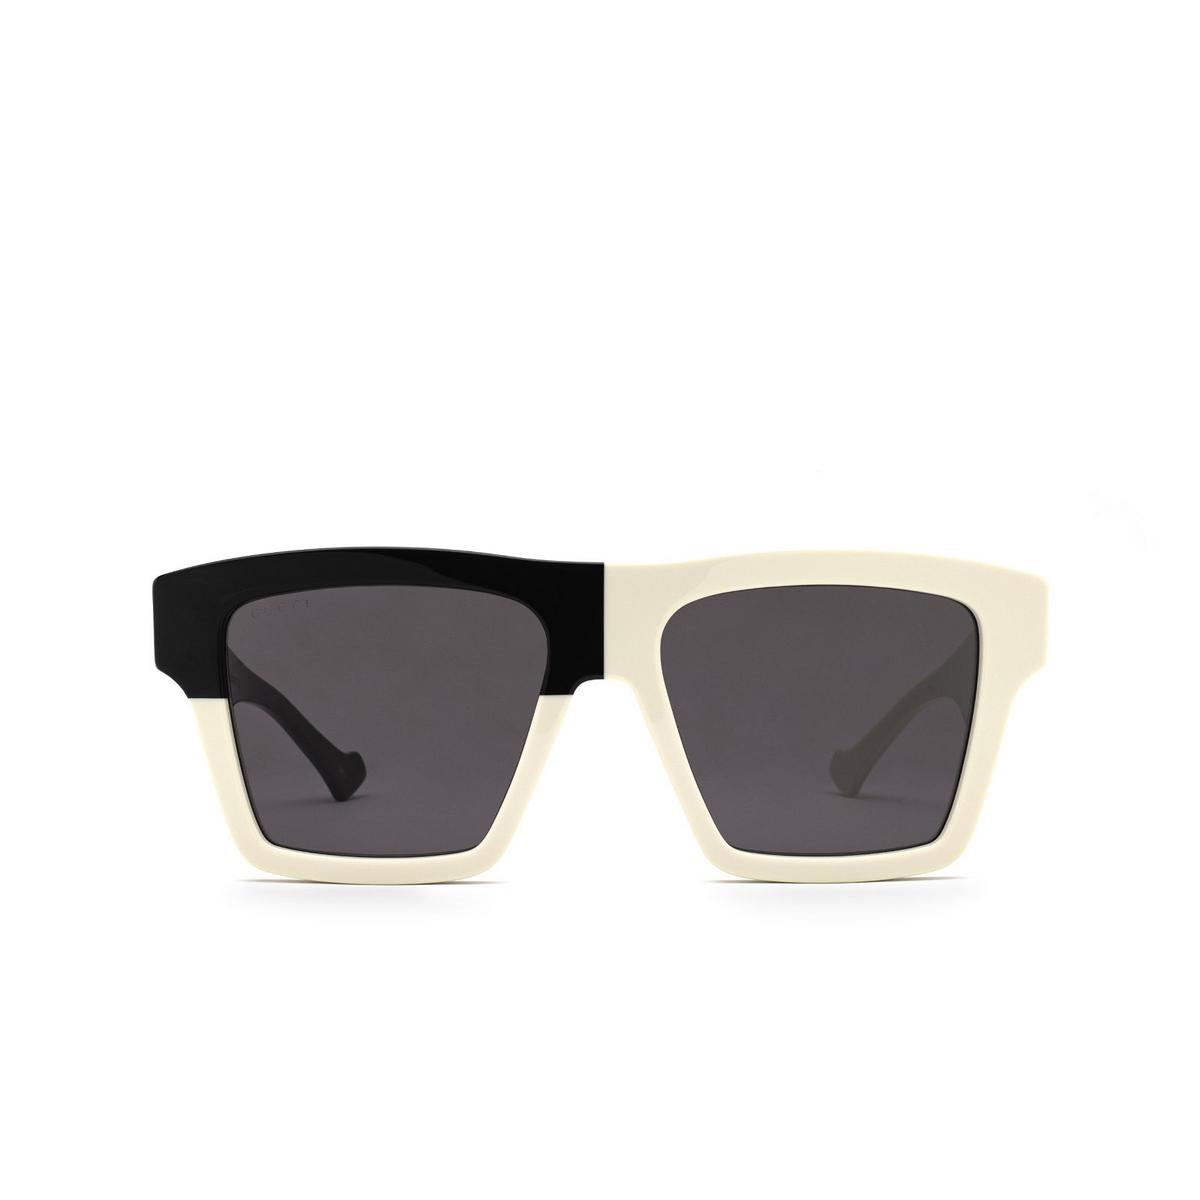 Gucci® Rectangle Sunglasses: GG0962S color White 007 - front view.